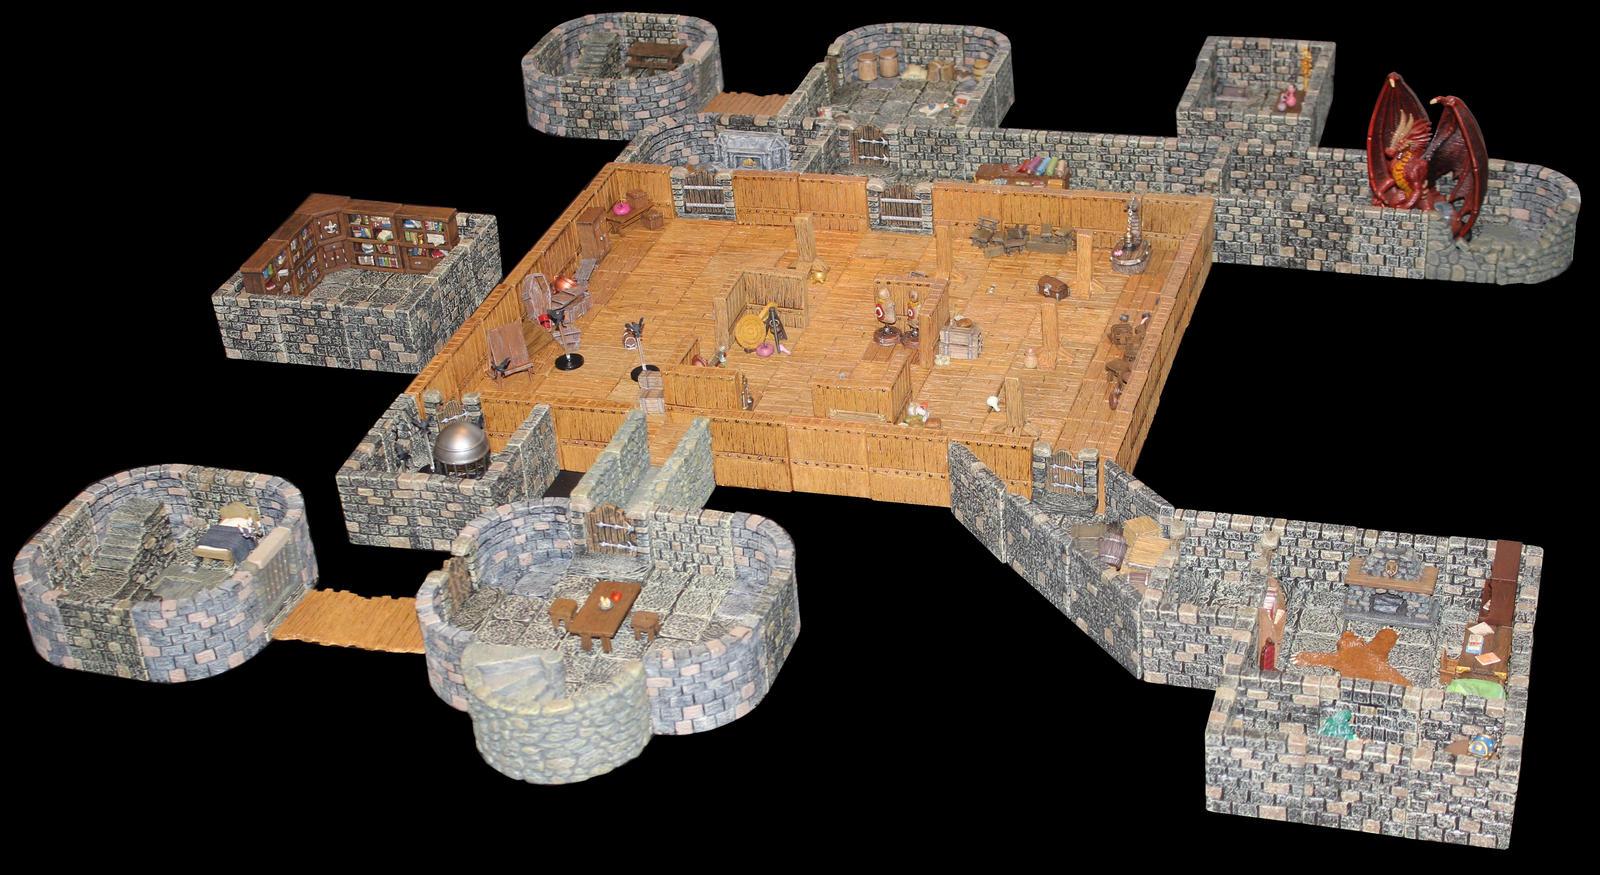 Castle Korvosa attic by MrVergee